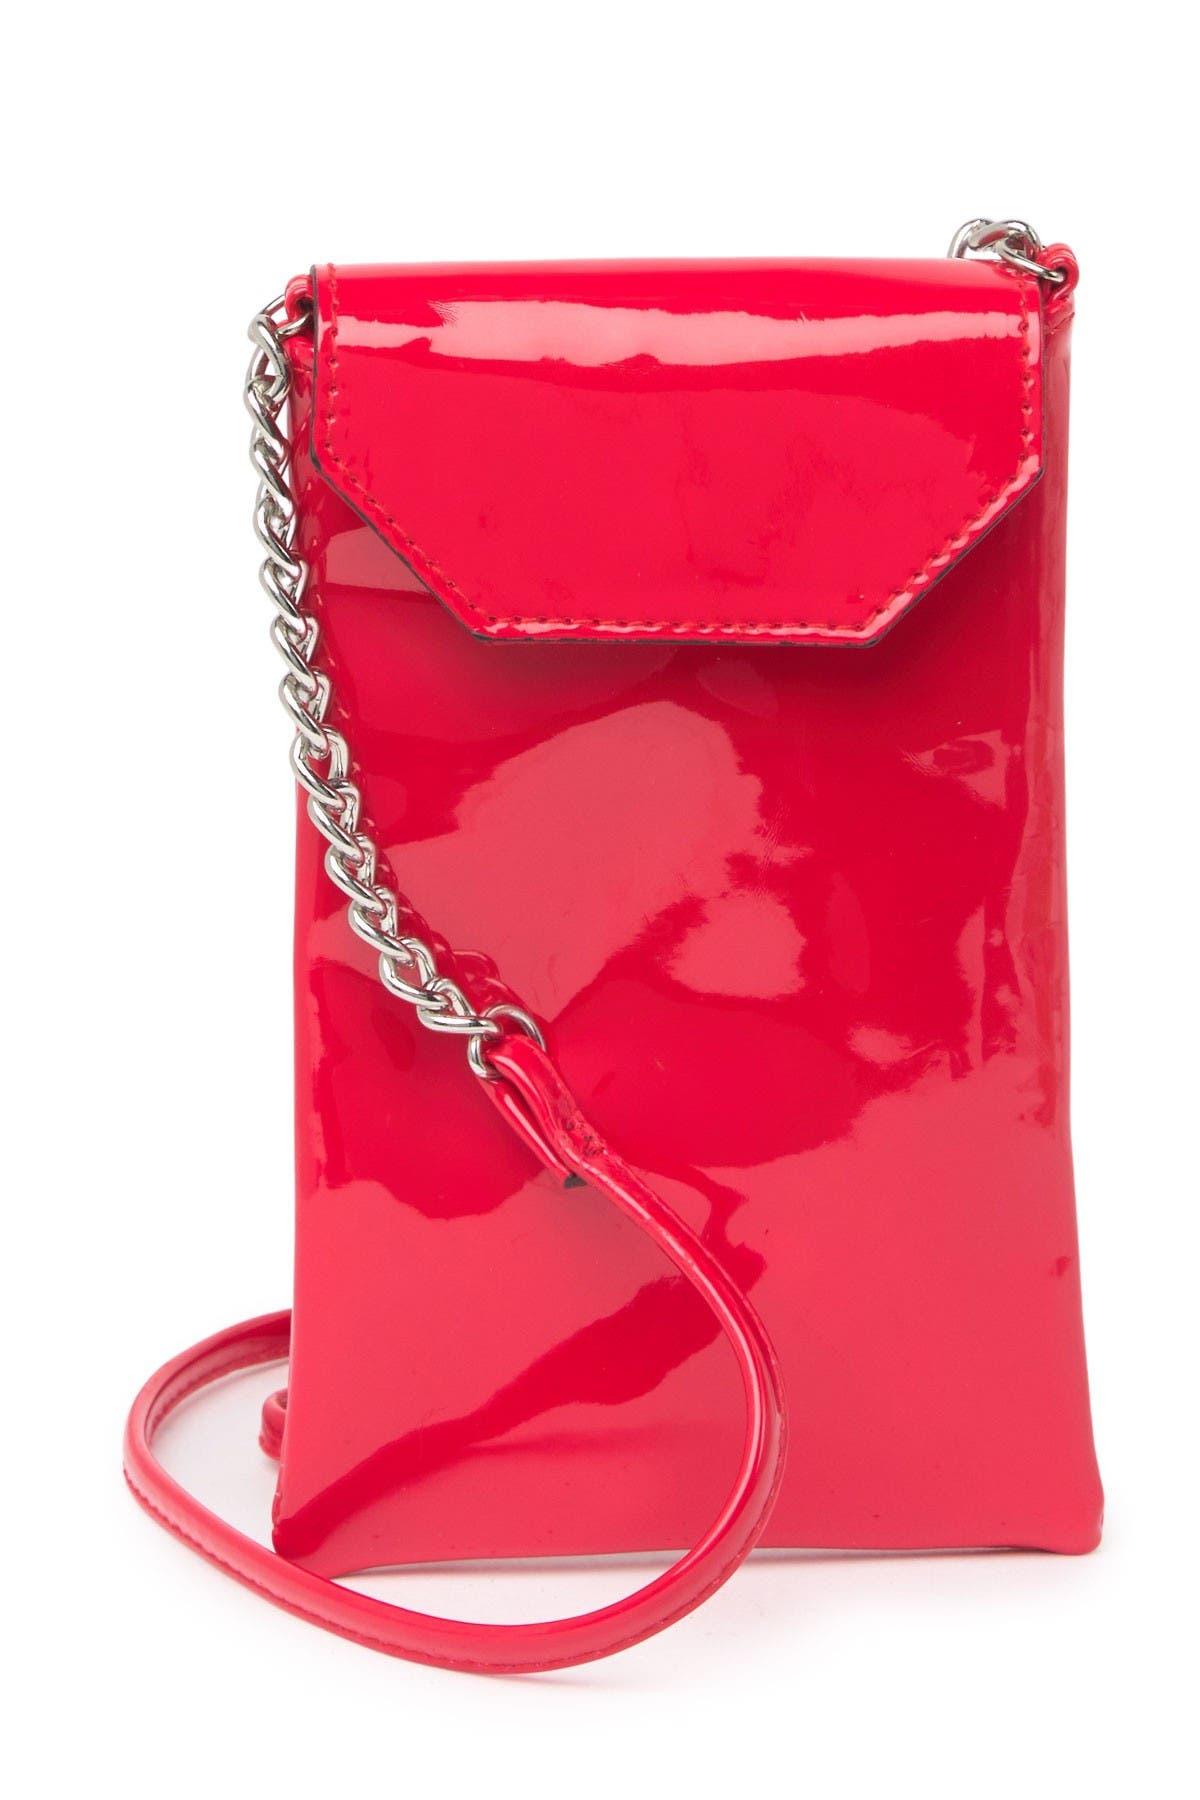 Image of Madden Girl Gifting Patent Crossbody Bag